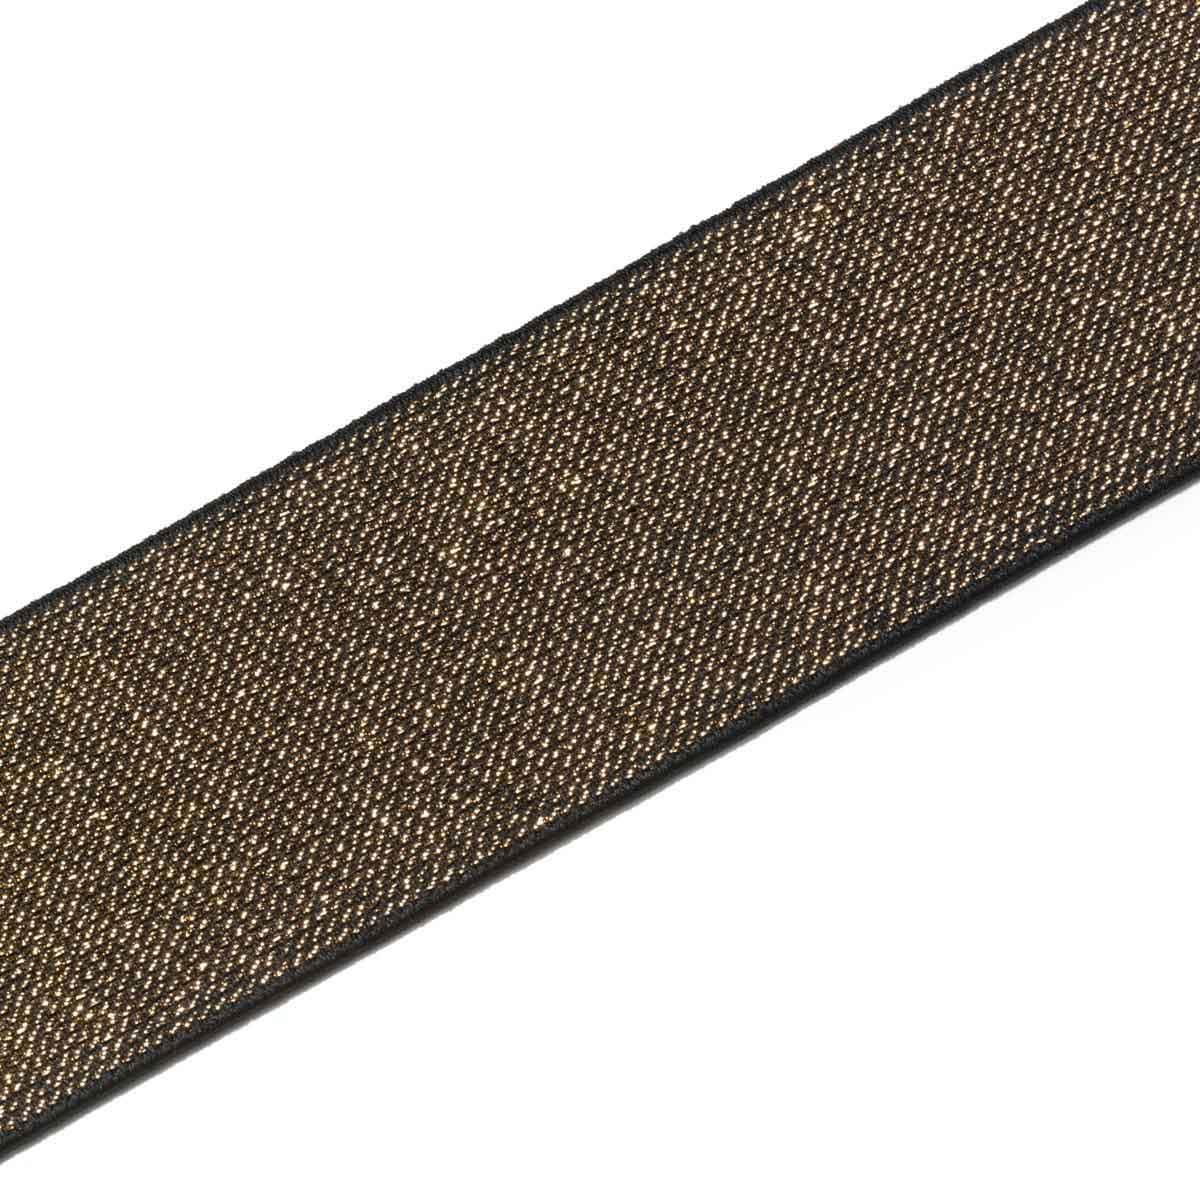 957469 Эластичная лента Color 50мм*7м, шоколад/золото